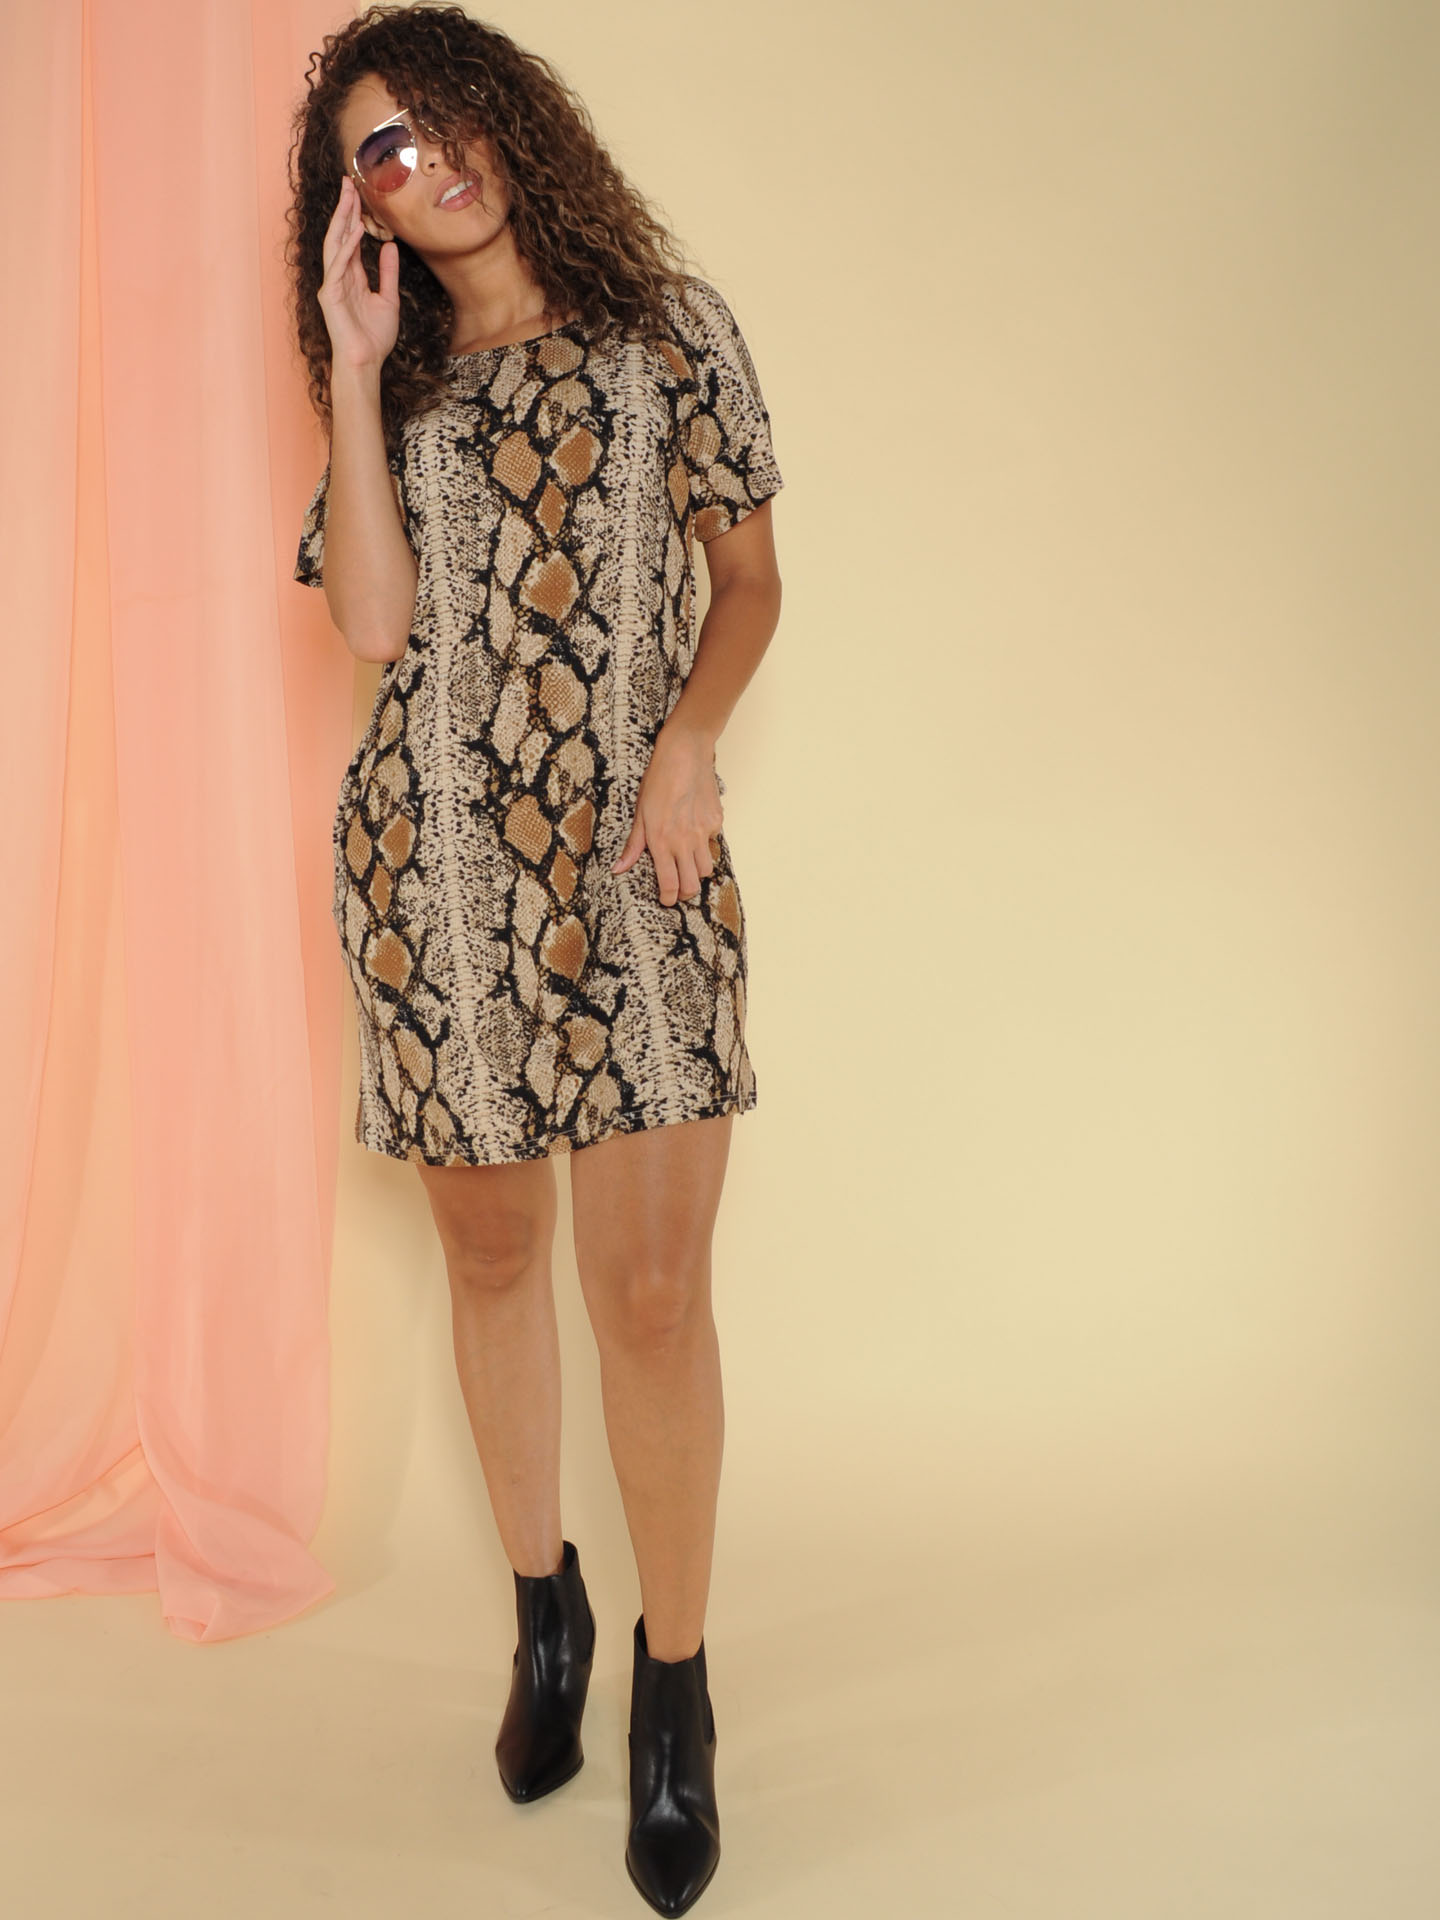 Viper Dress Pocketed Snake Print Tee Dress Front